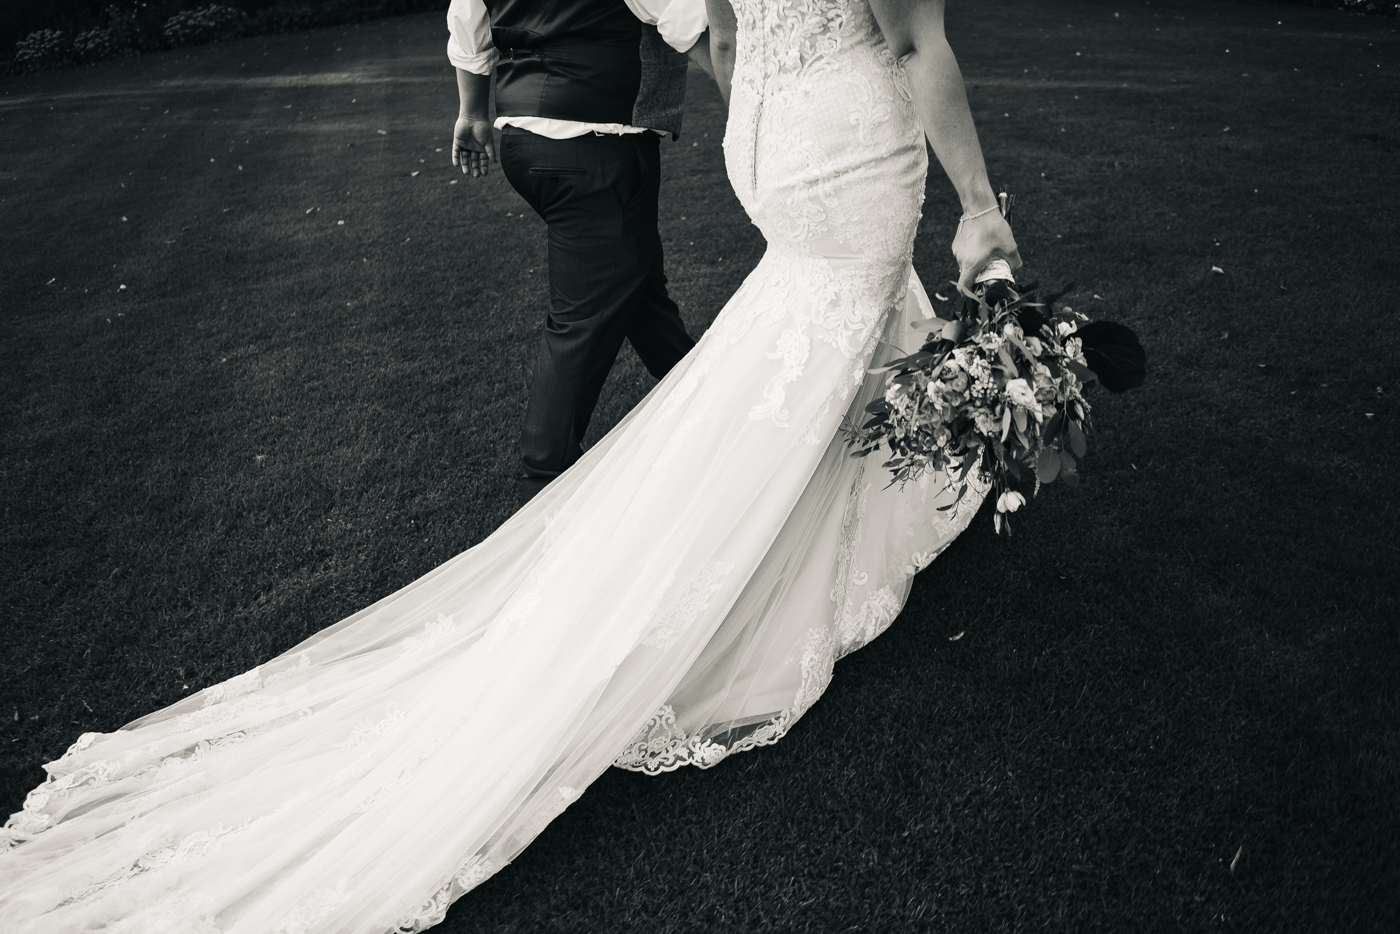 headlame-hall-north-yorkshire-north-east-photographer-wedding-0046.jpg